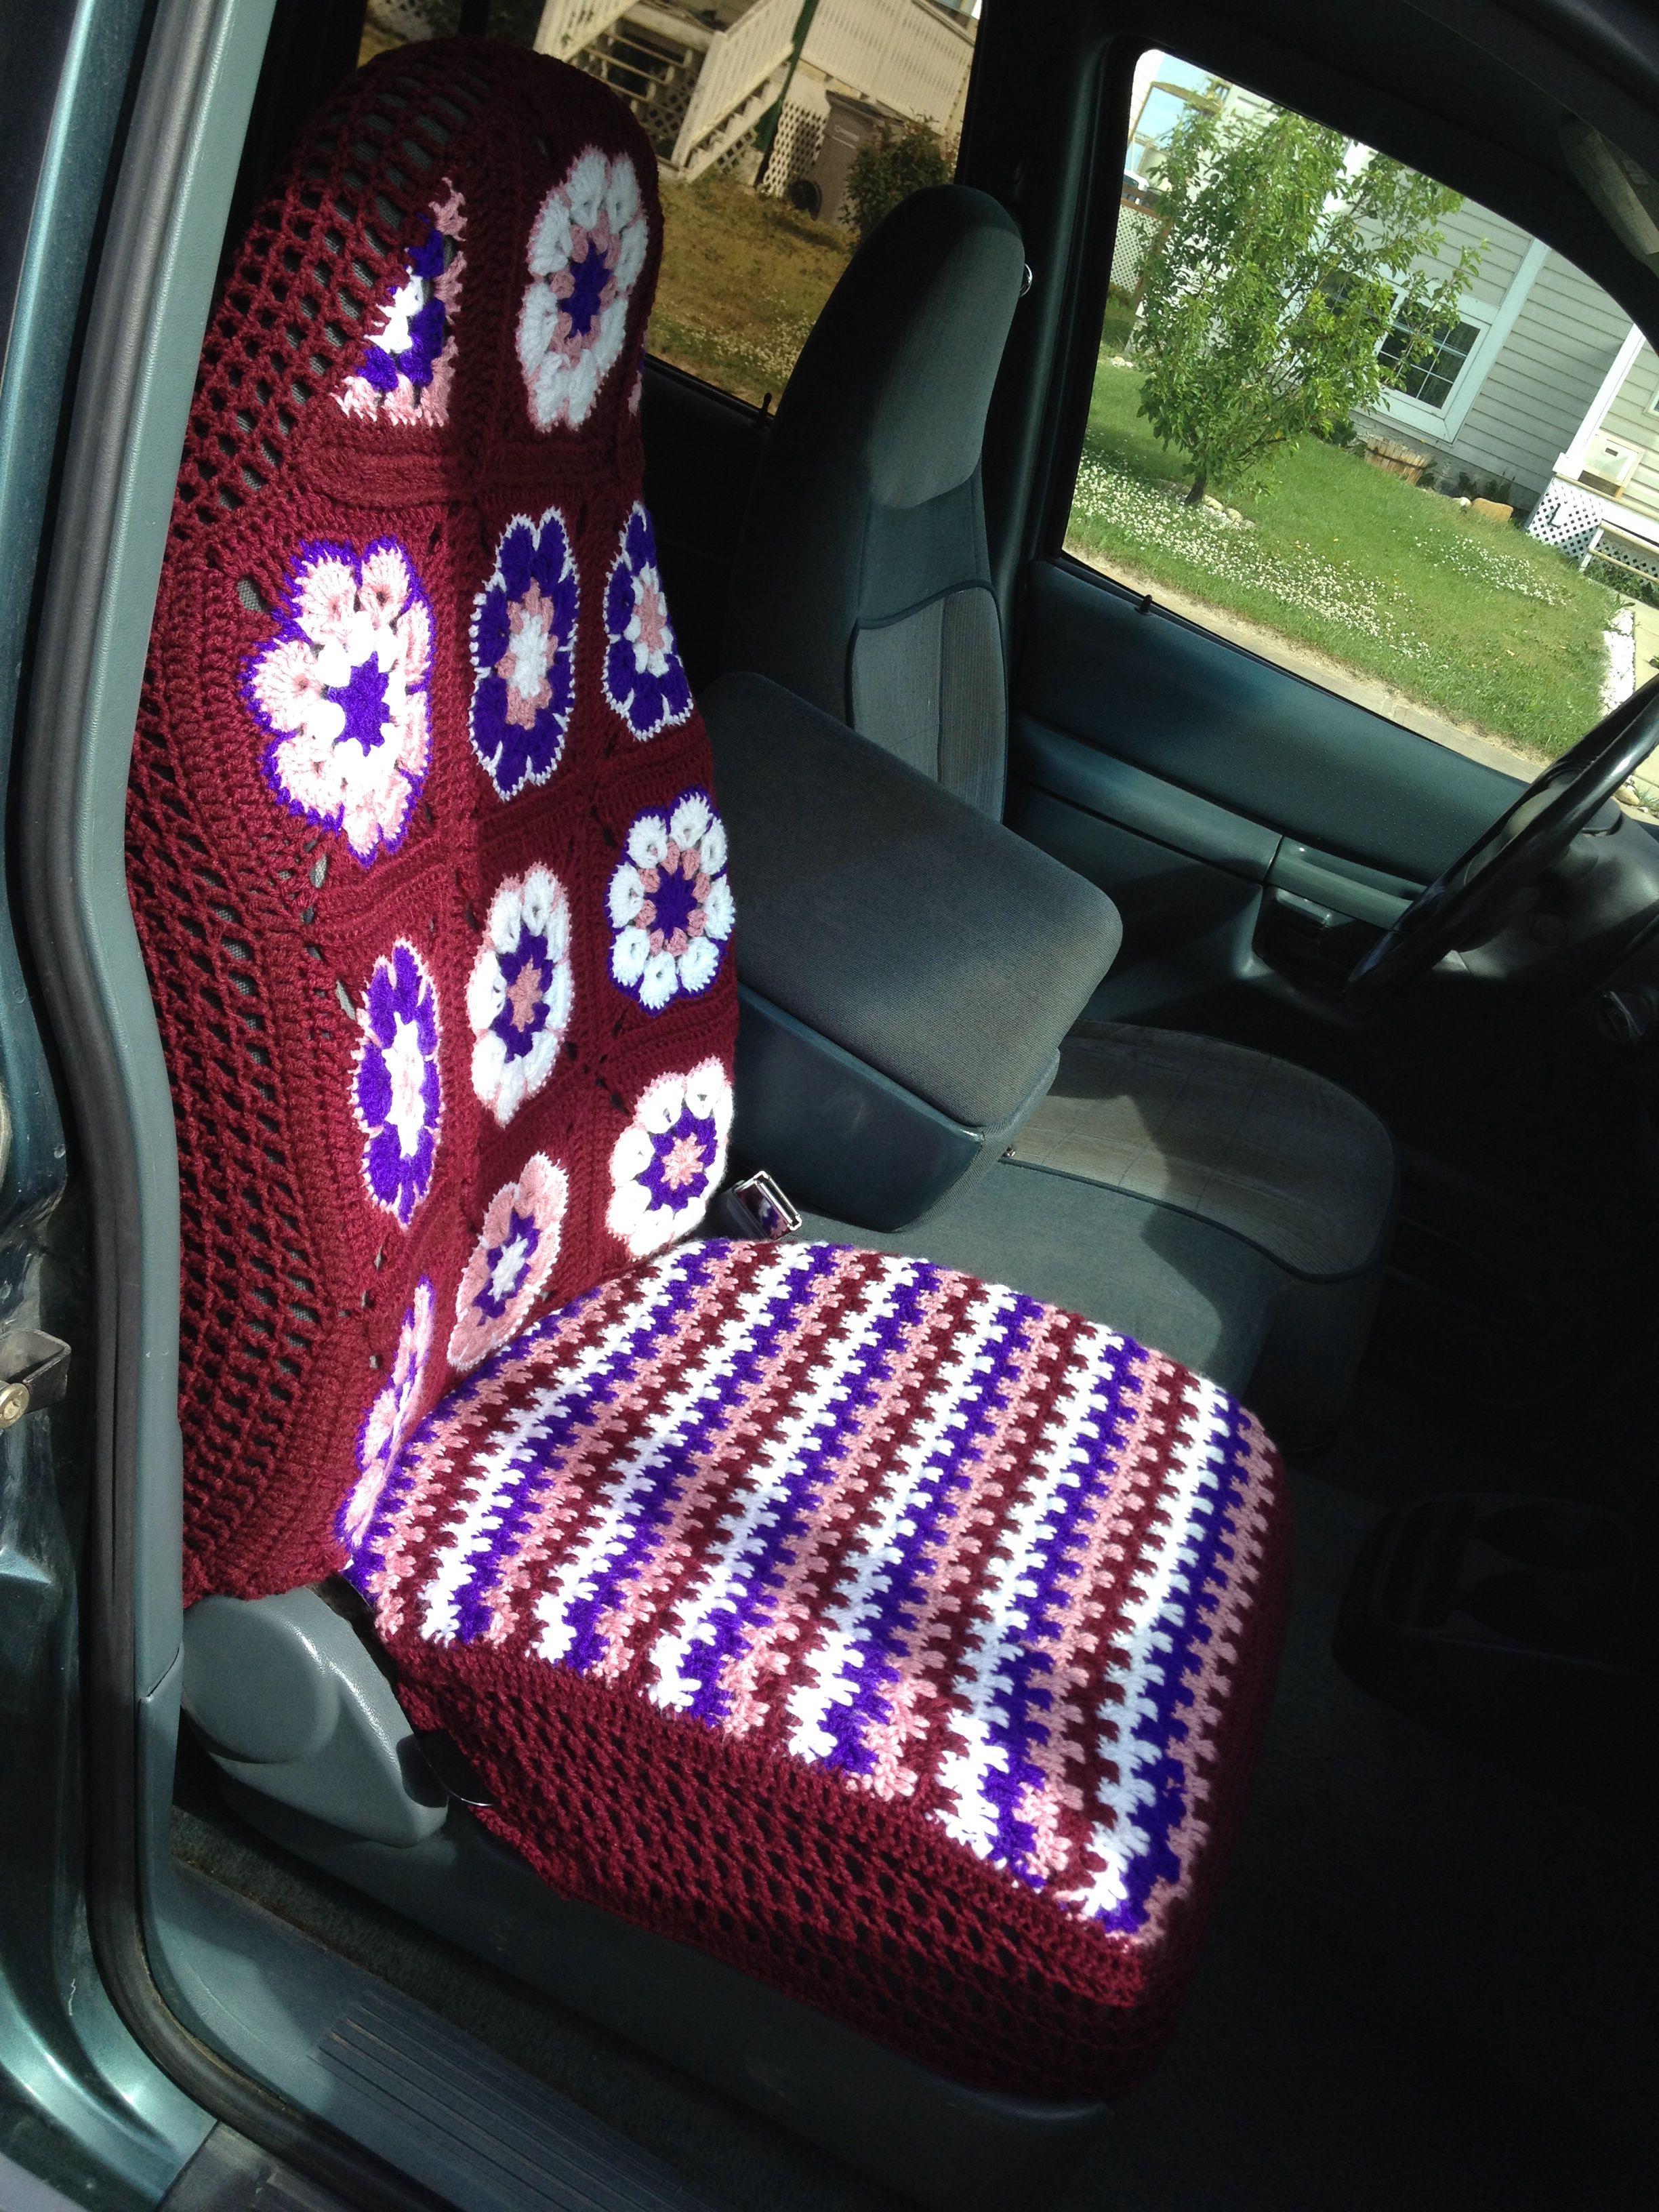 crochet car seat cover no pattern just winged it h keln pinterest kissenbez ge n hen. Black Bedroom Furniture Sets. Home Design Ideas